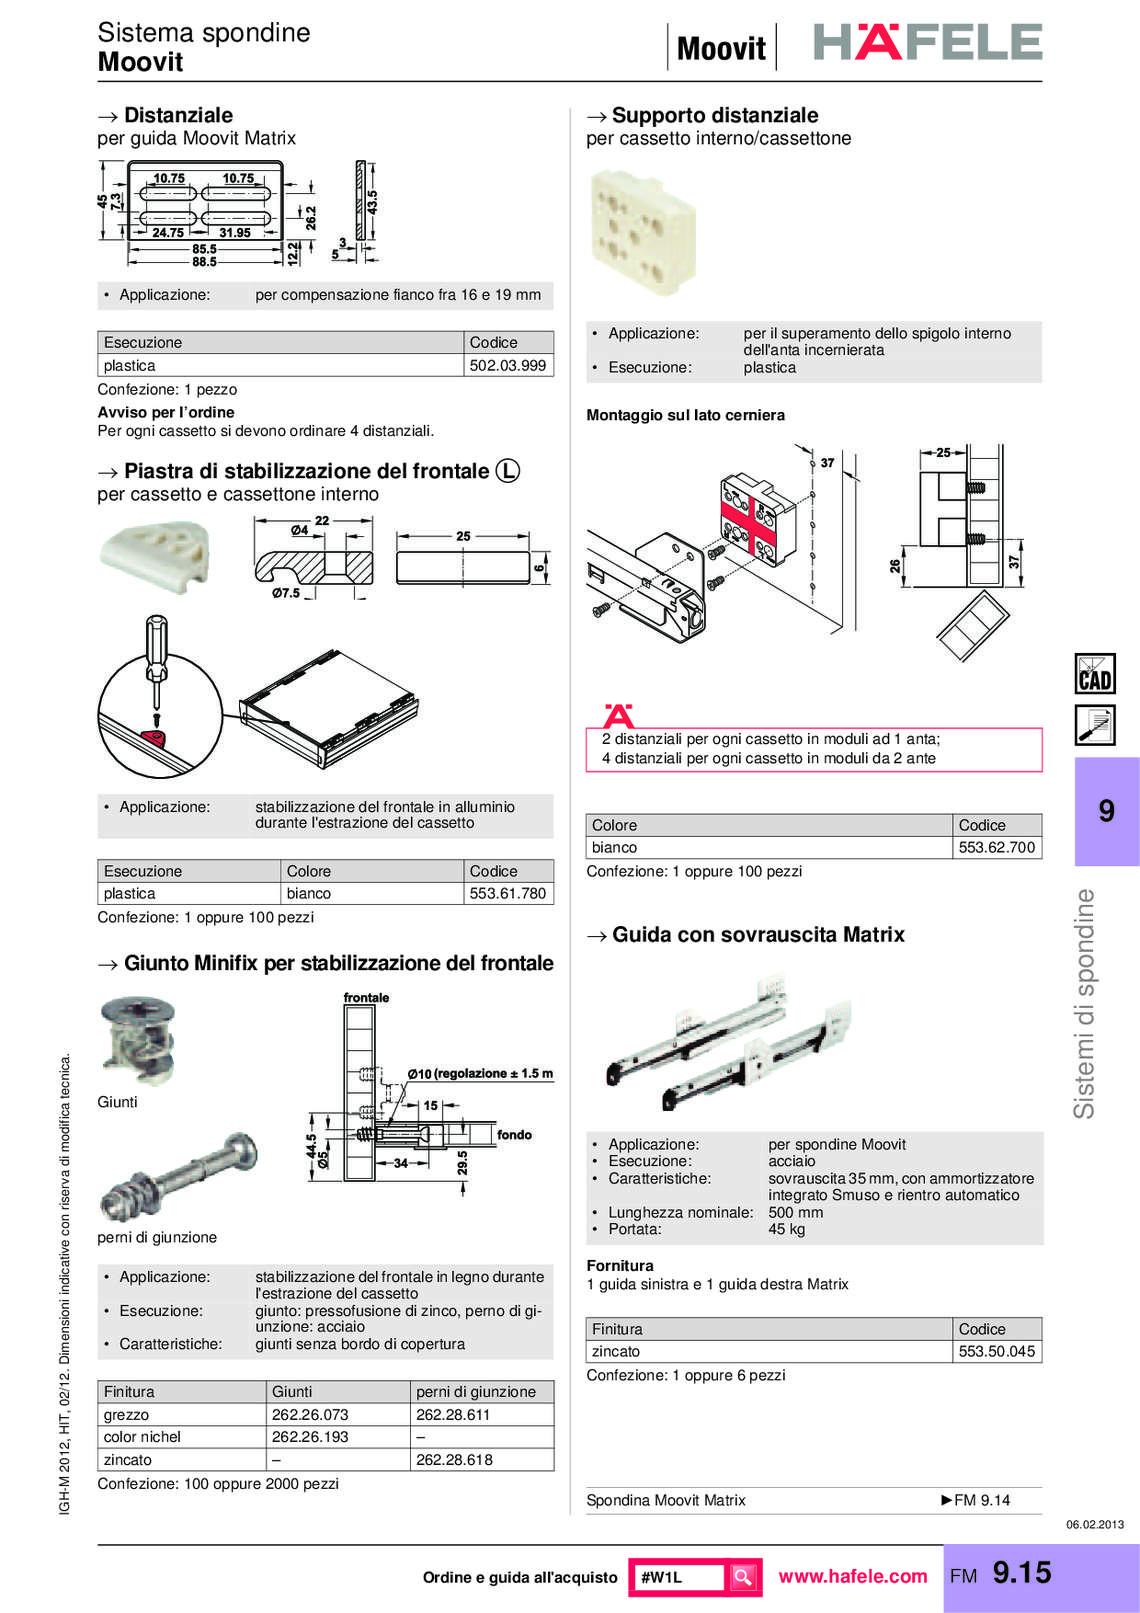 hafele-spondine-e-guide-per-mobili_40_028.jpg